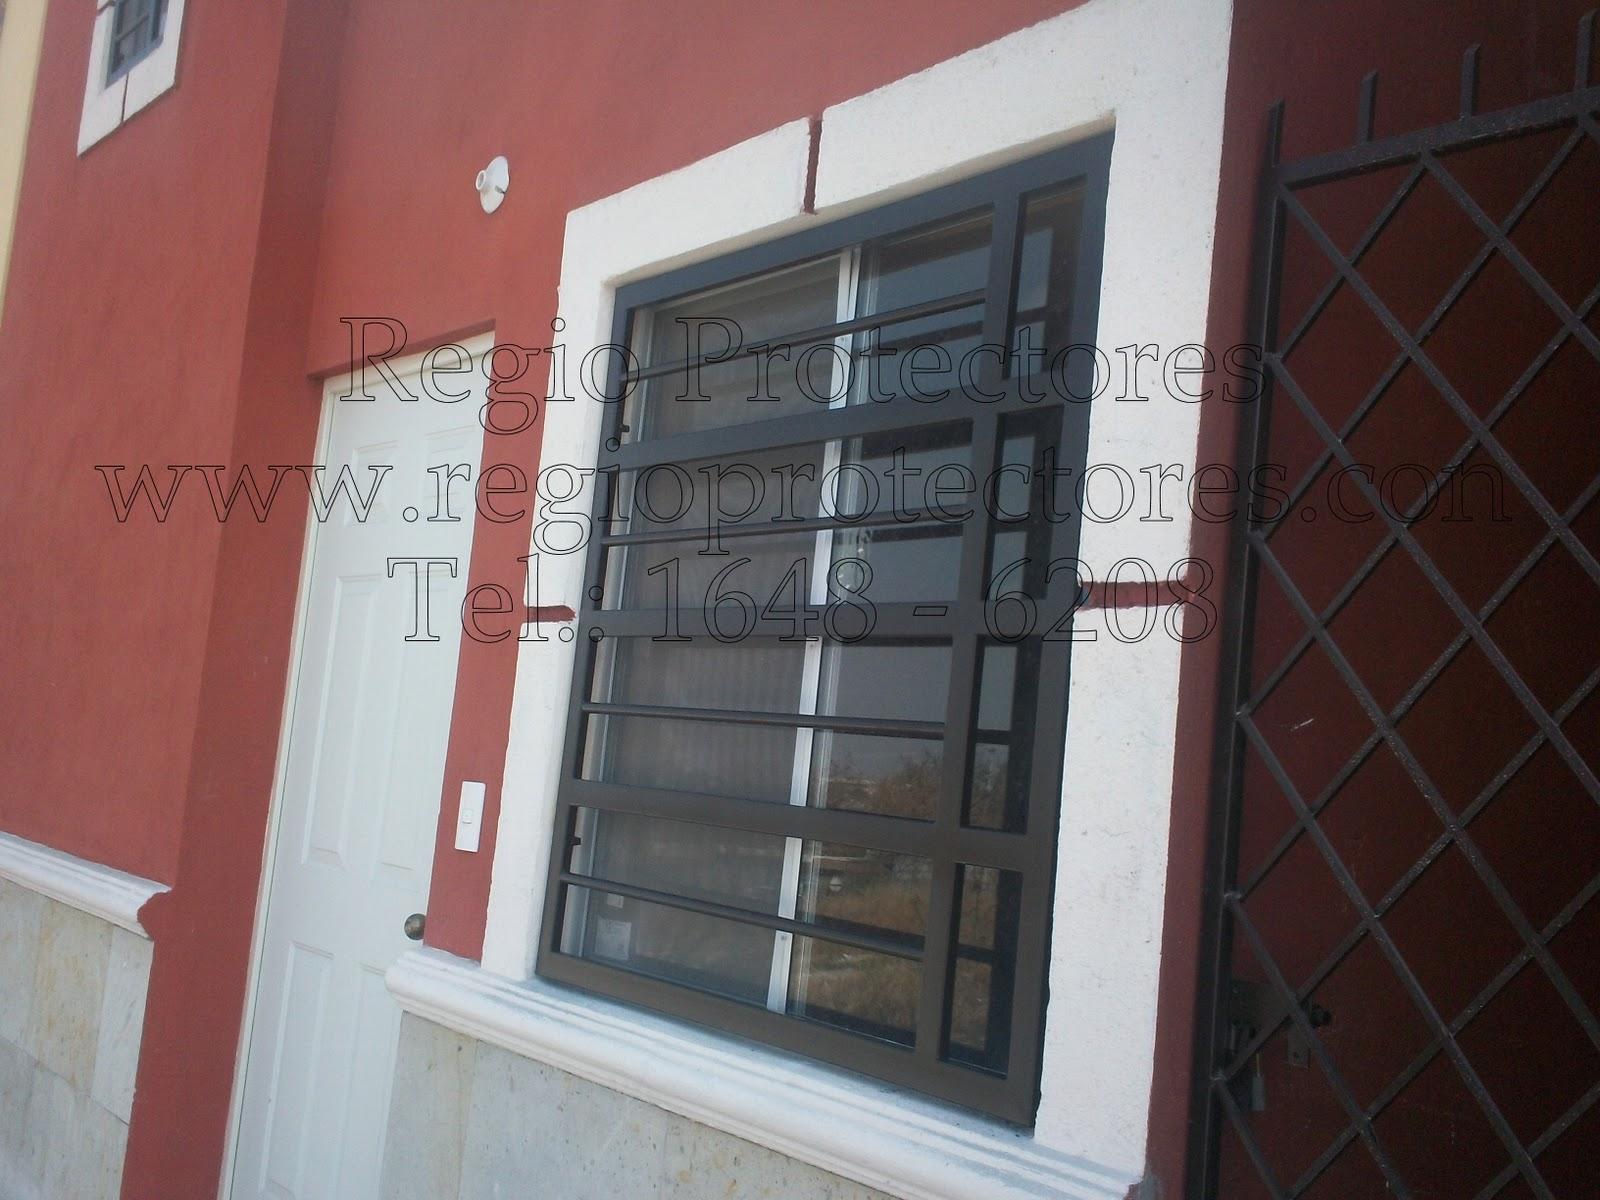 Diseno ventanas puertas herreria picture car interior design for Modelos de puertas de herreria